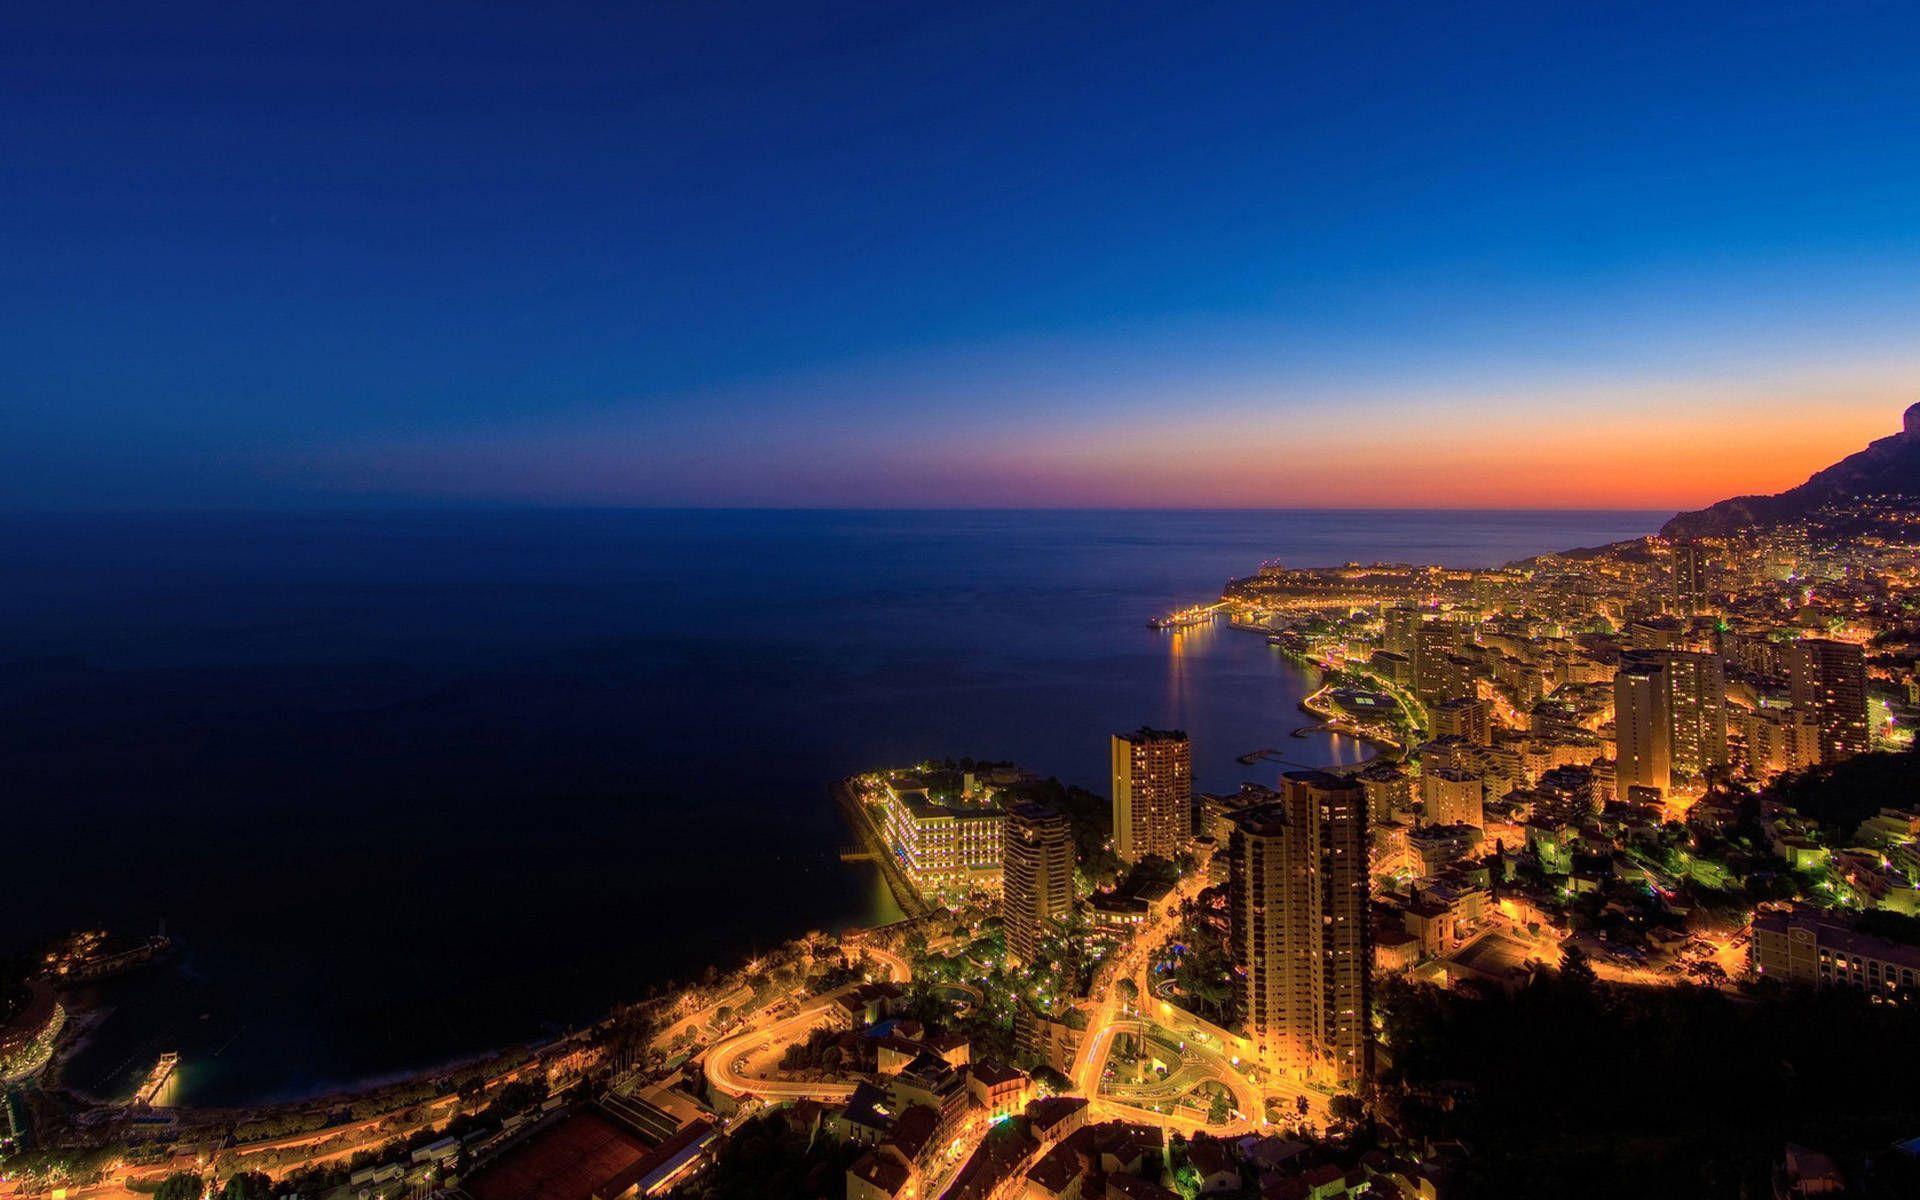 Beautiful Monaco City At Night Wallpaper Deskt #10727 Wallpaper ...